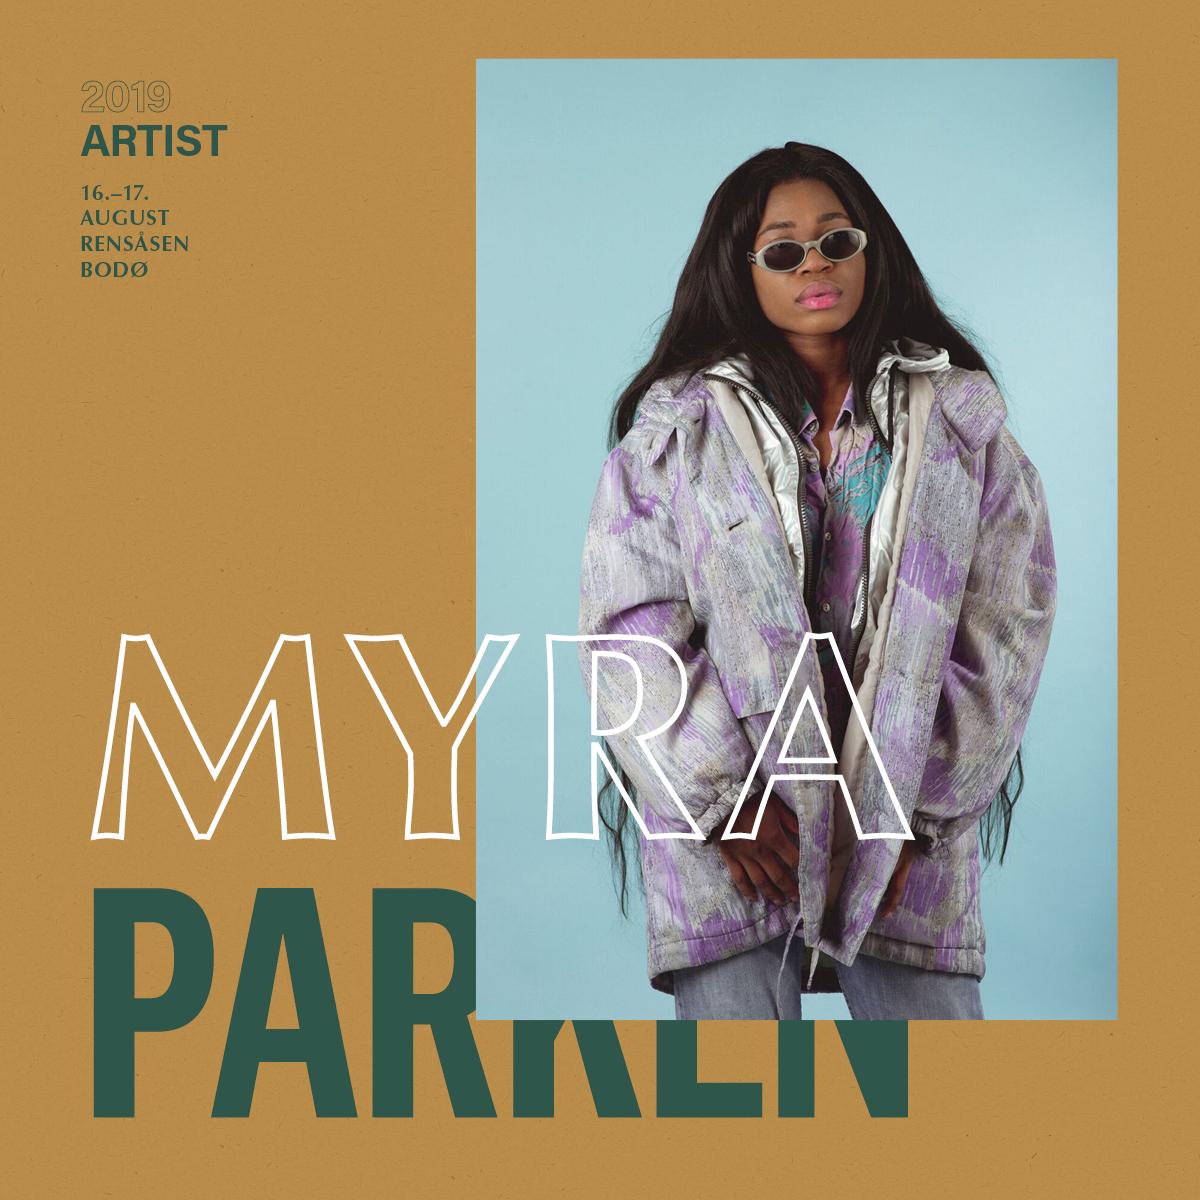 BYRAA_Parken_2019_Artistslipp_Myra_1200x1200px.jpg